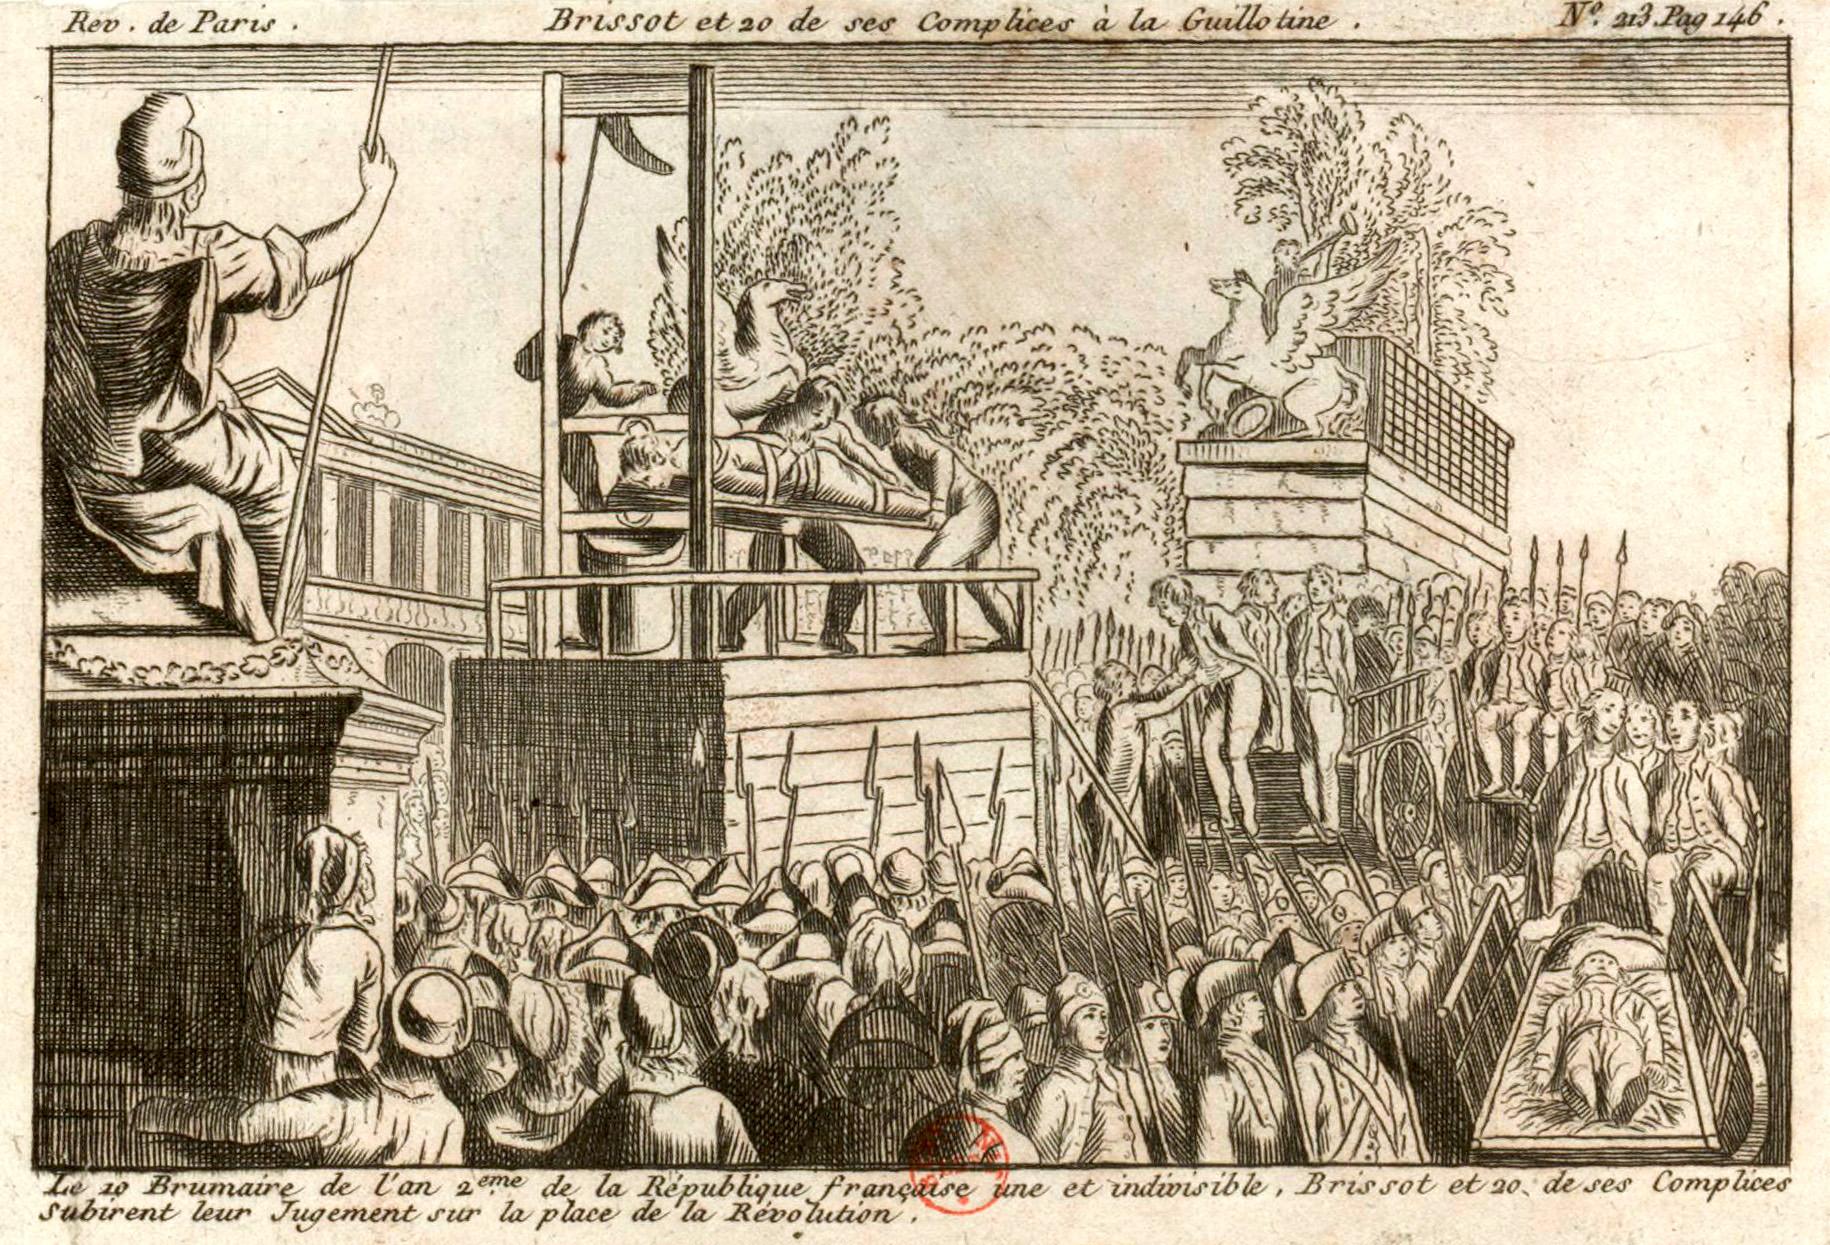 File:La fournée des Girondins 10-11-1793.jpg